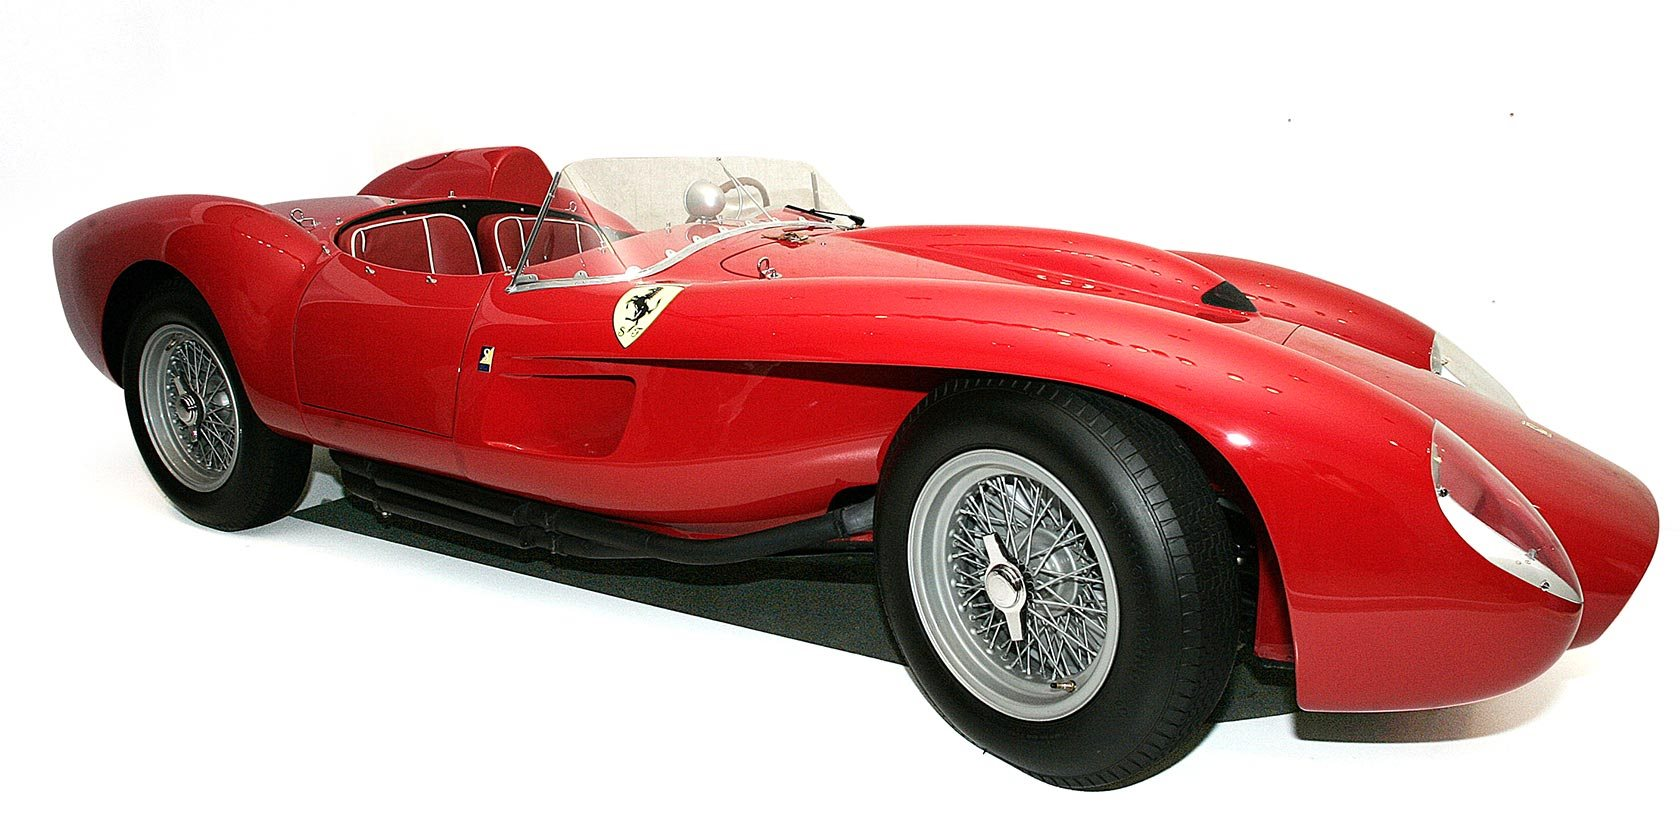 Ferrari 250 GTO from 1962